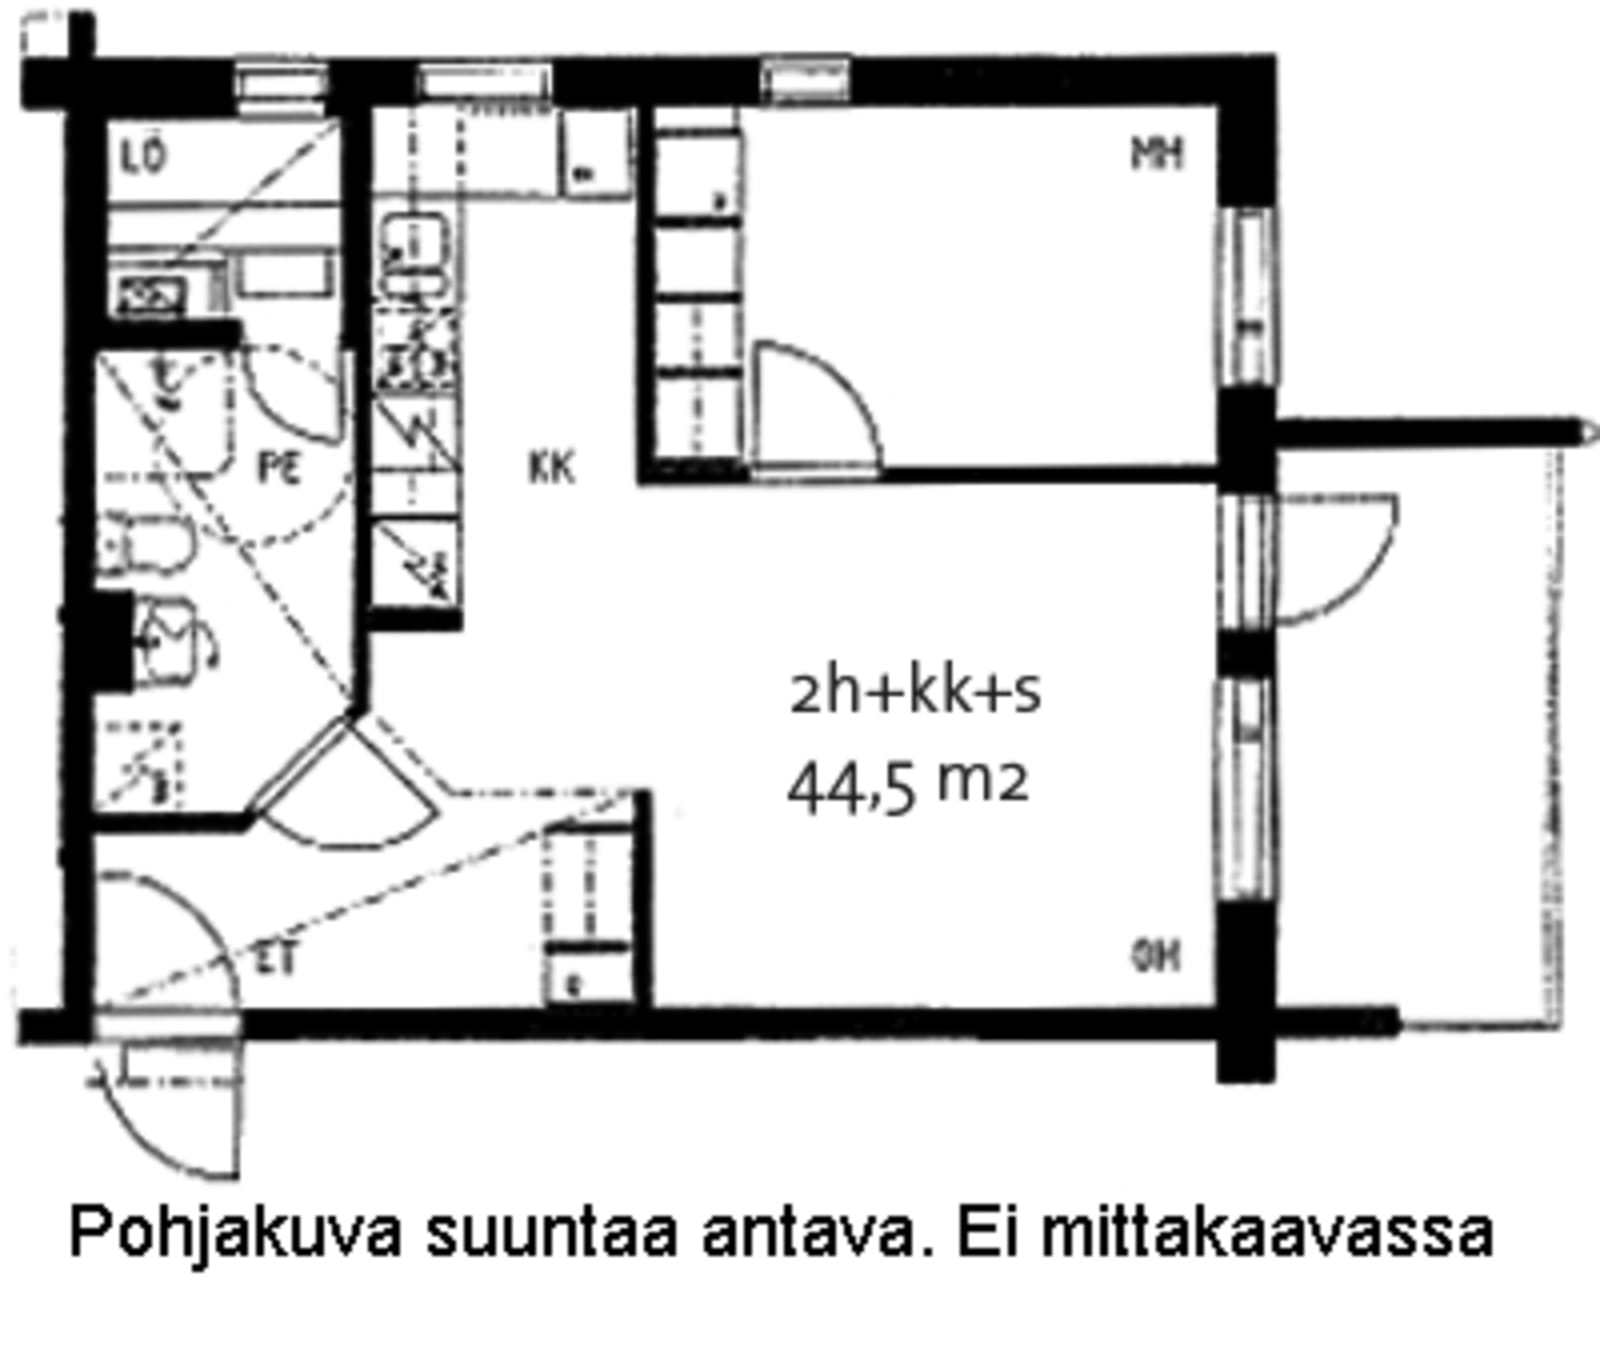 Kaarina, Piispanristi, Kultarinnankatu 4 A 027